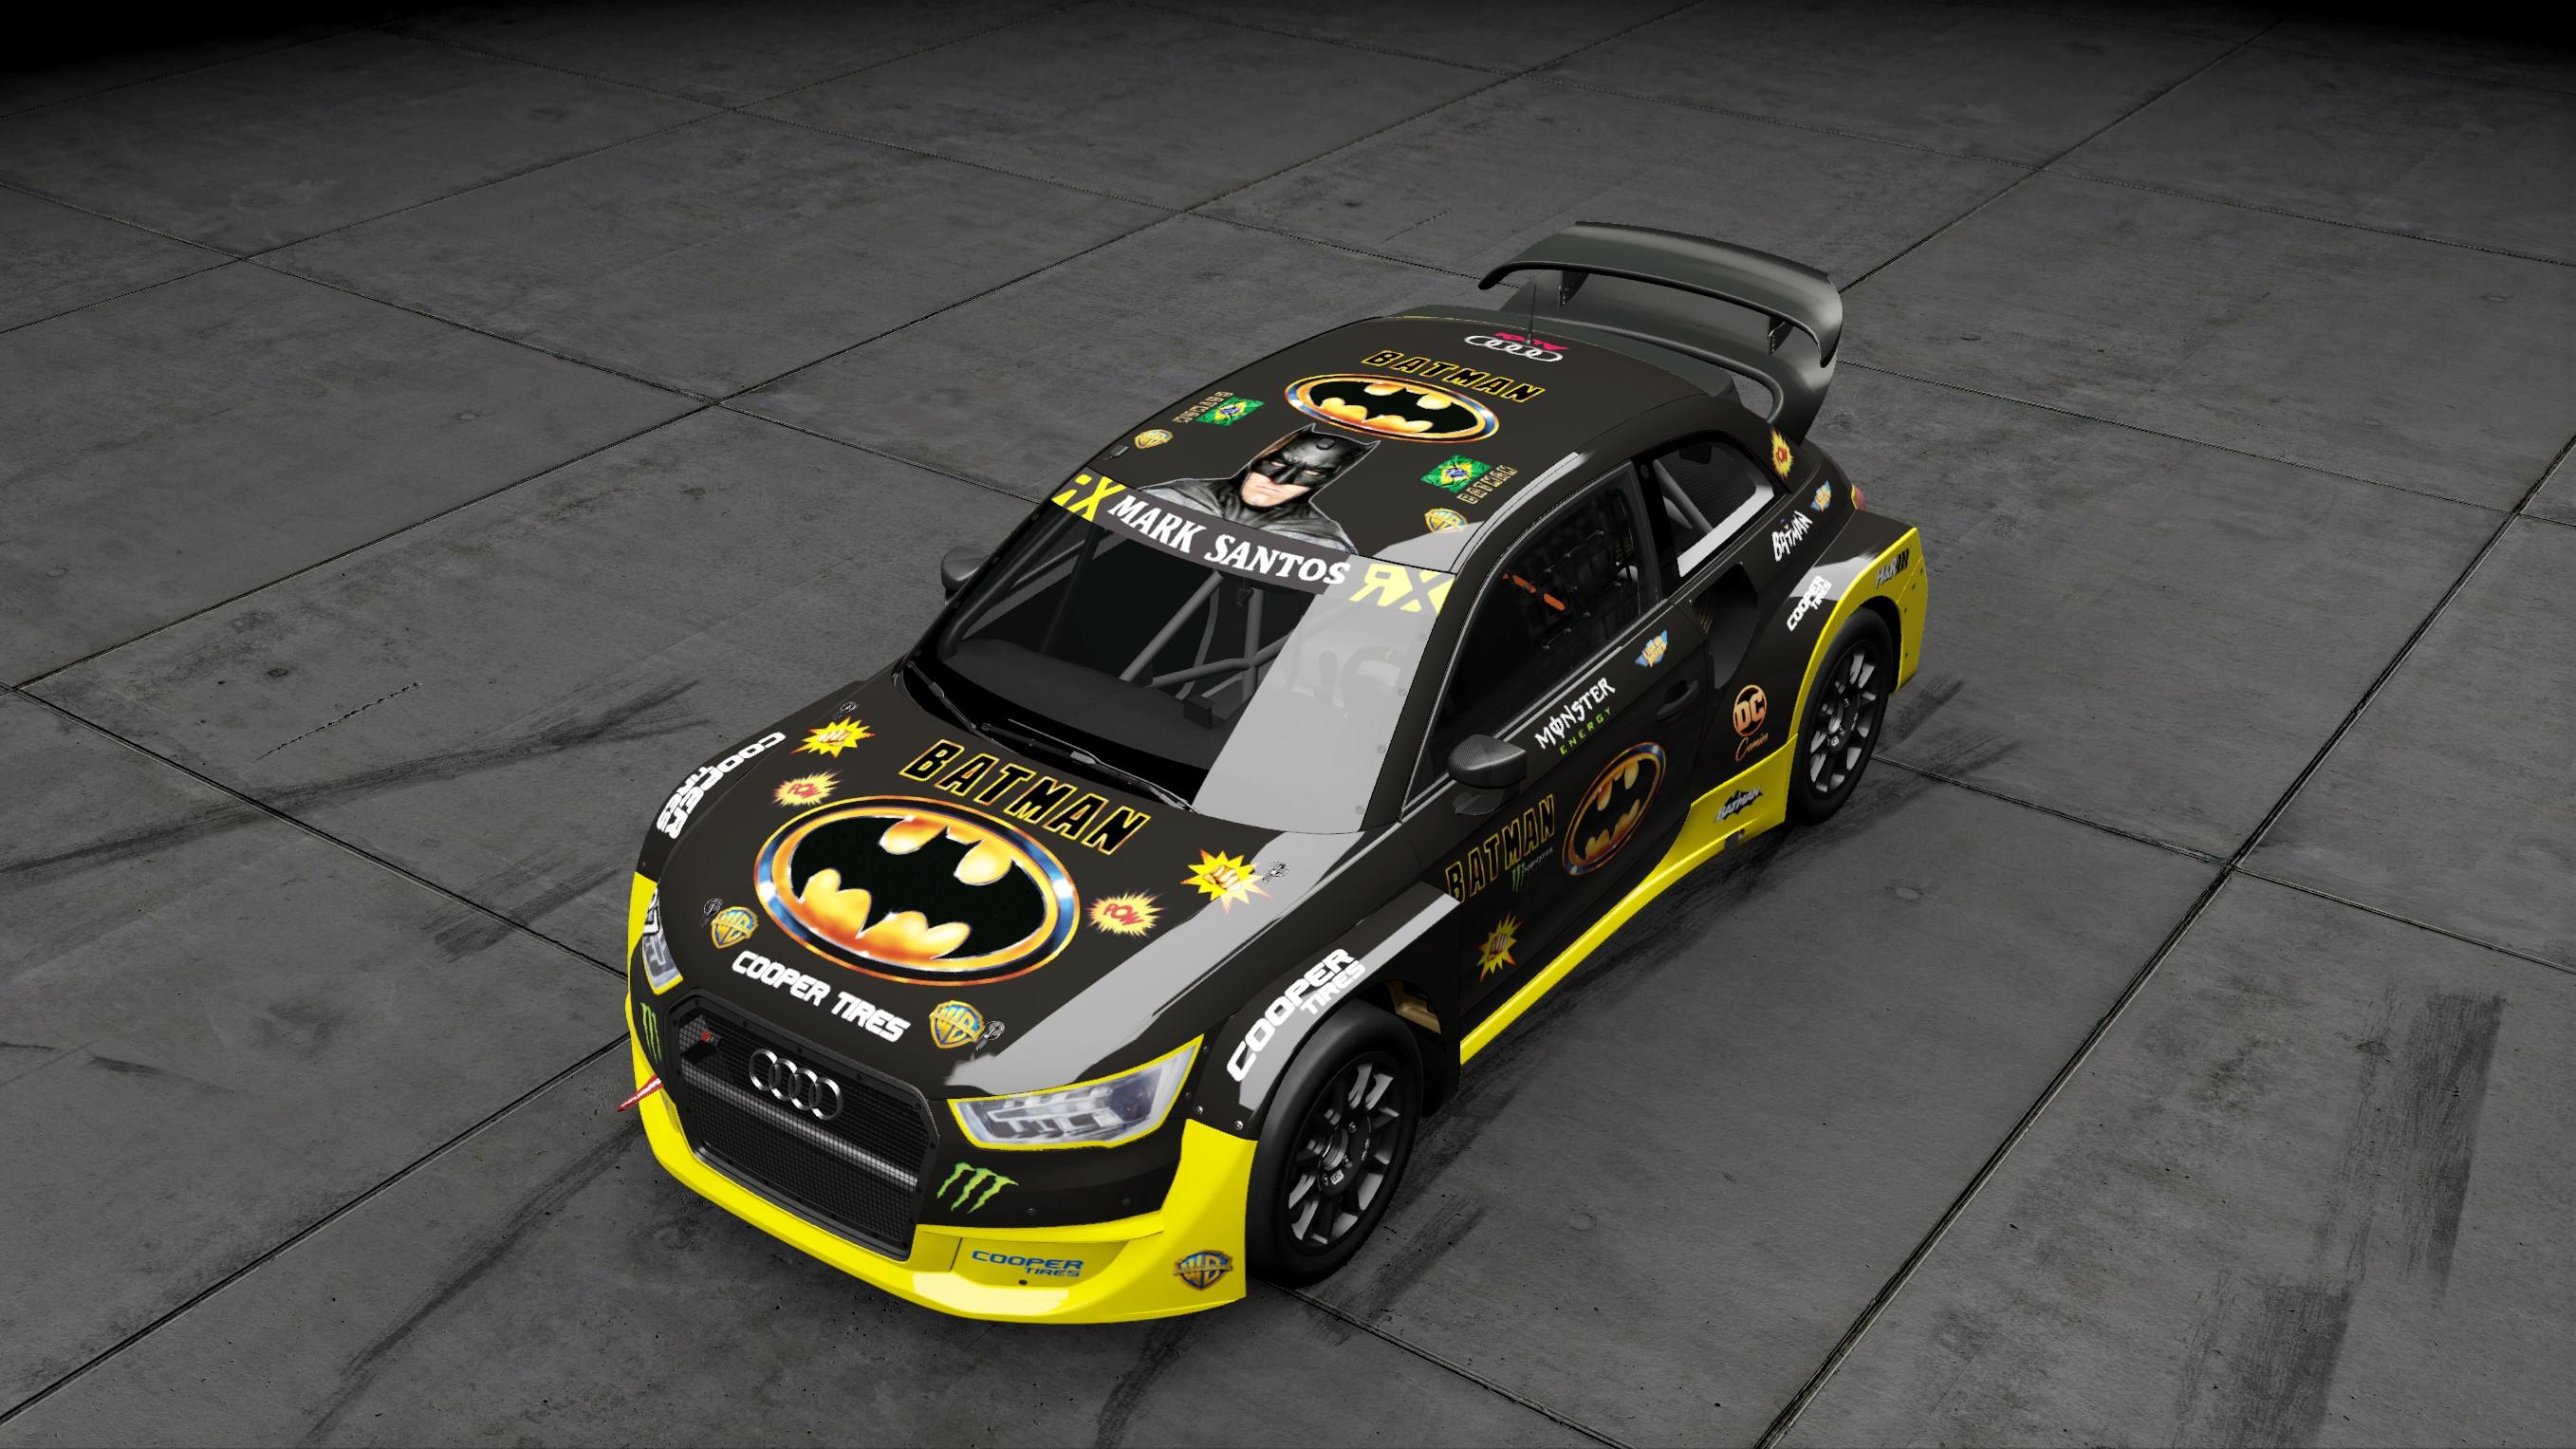 PCars2_audi_s1_eks_livery_Batman - Copia.jpg